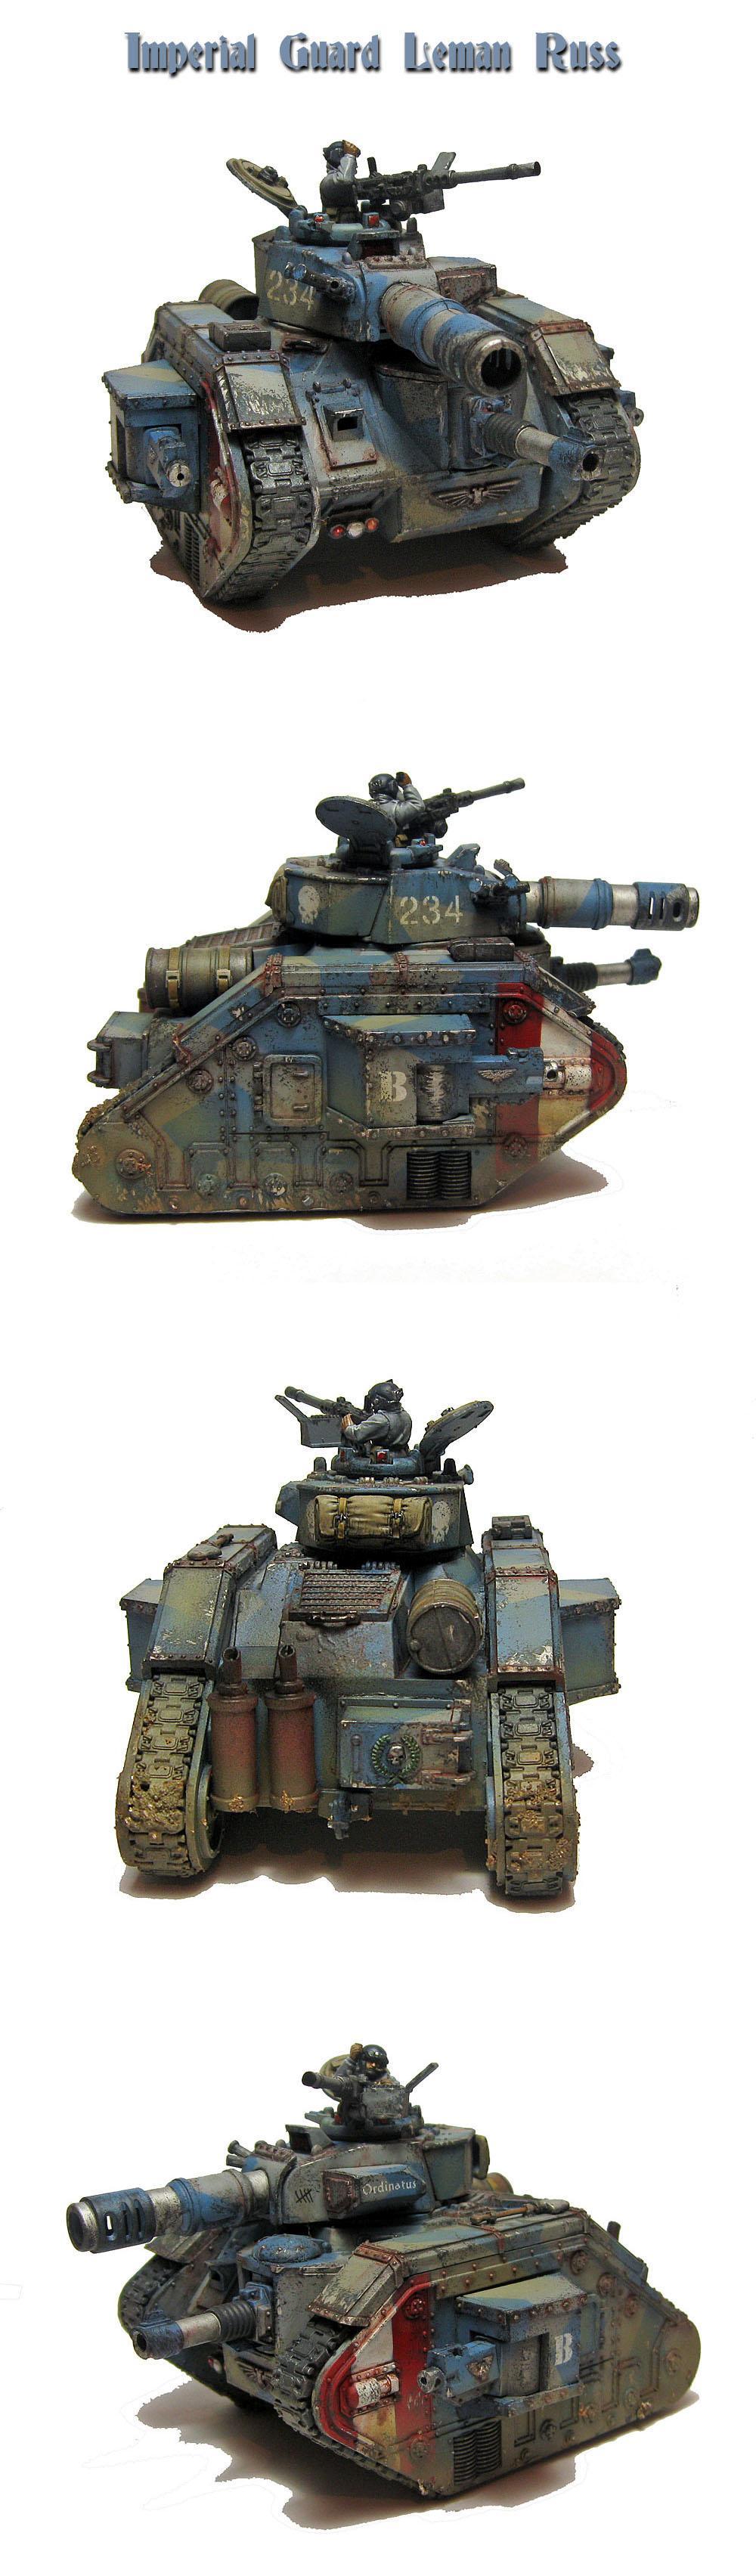 Blue Camo, Leman Russ, Tank, Weathered